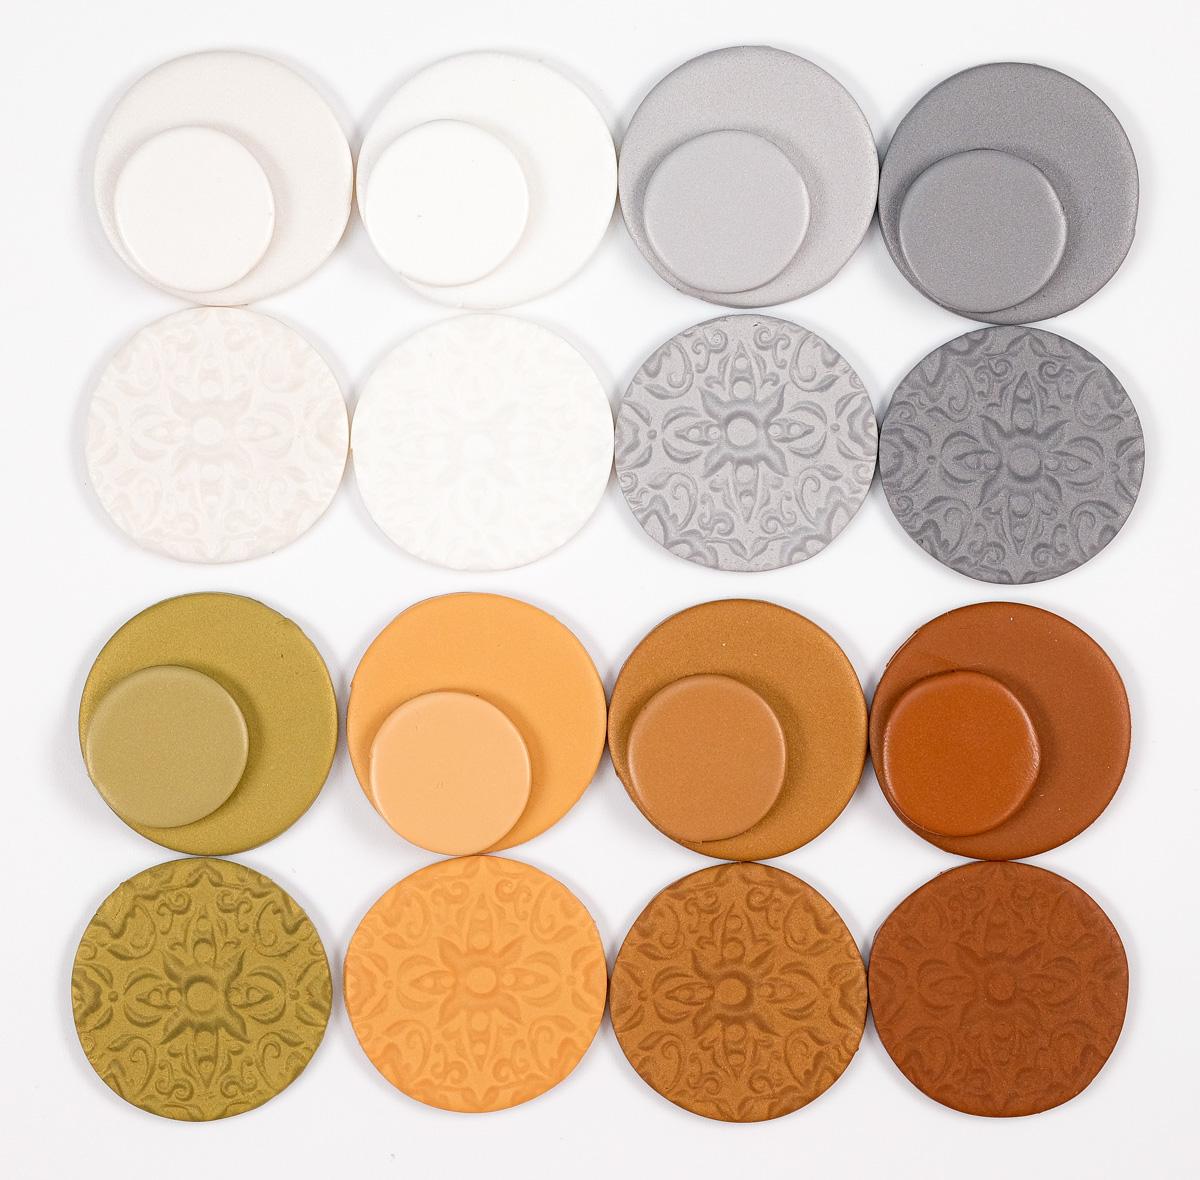 pardo jewellery clay in metallic colors